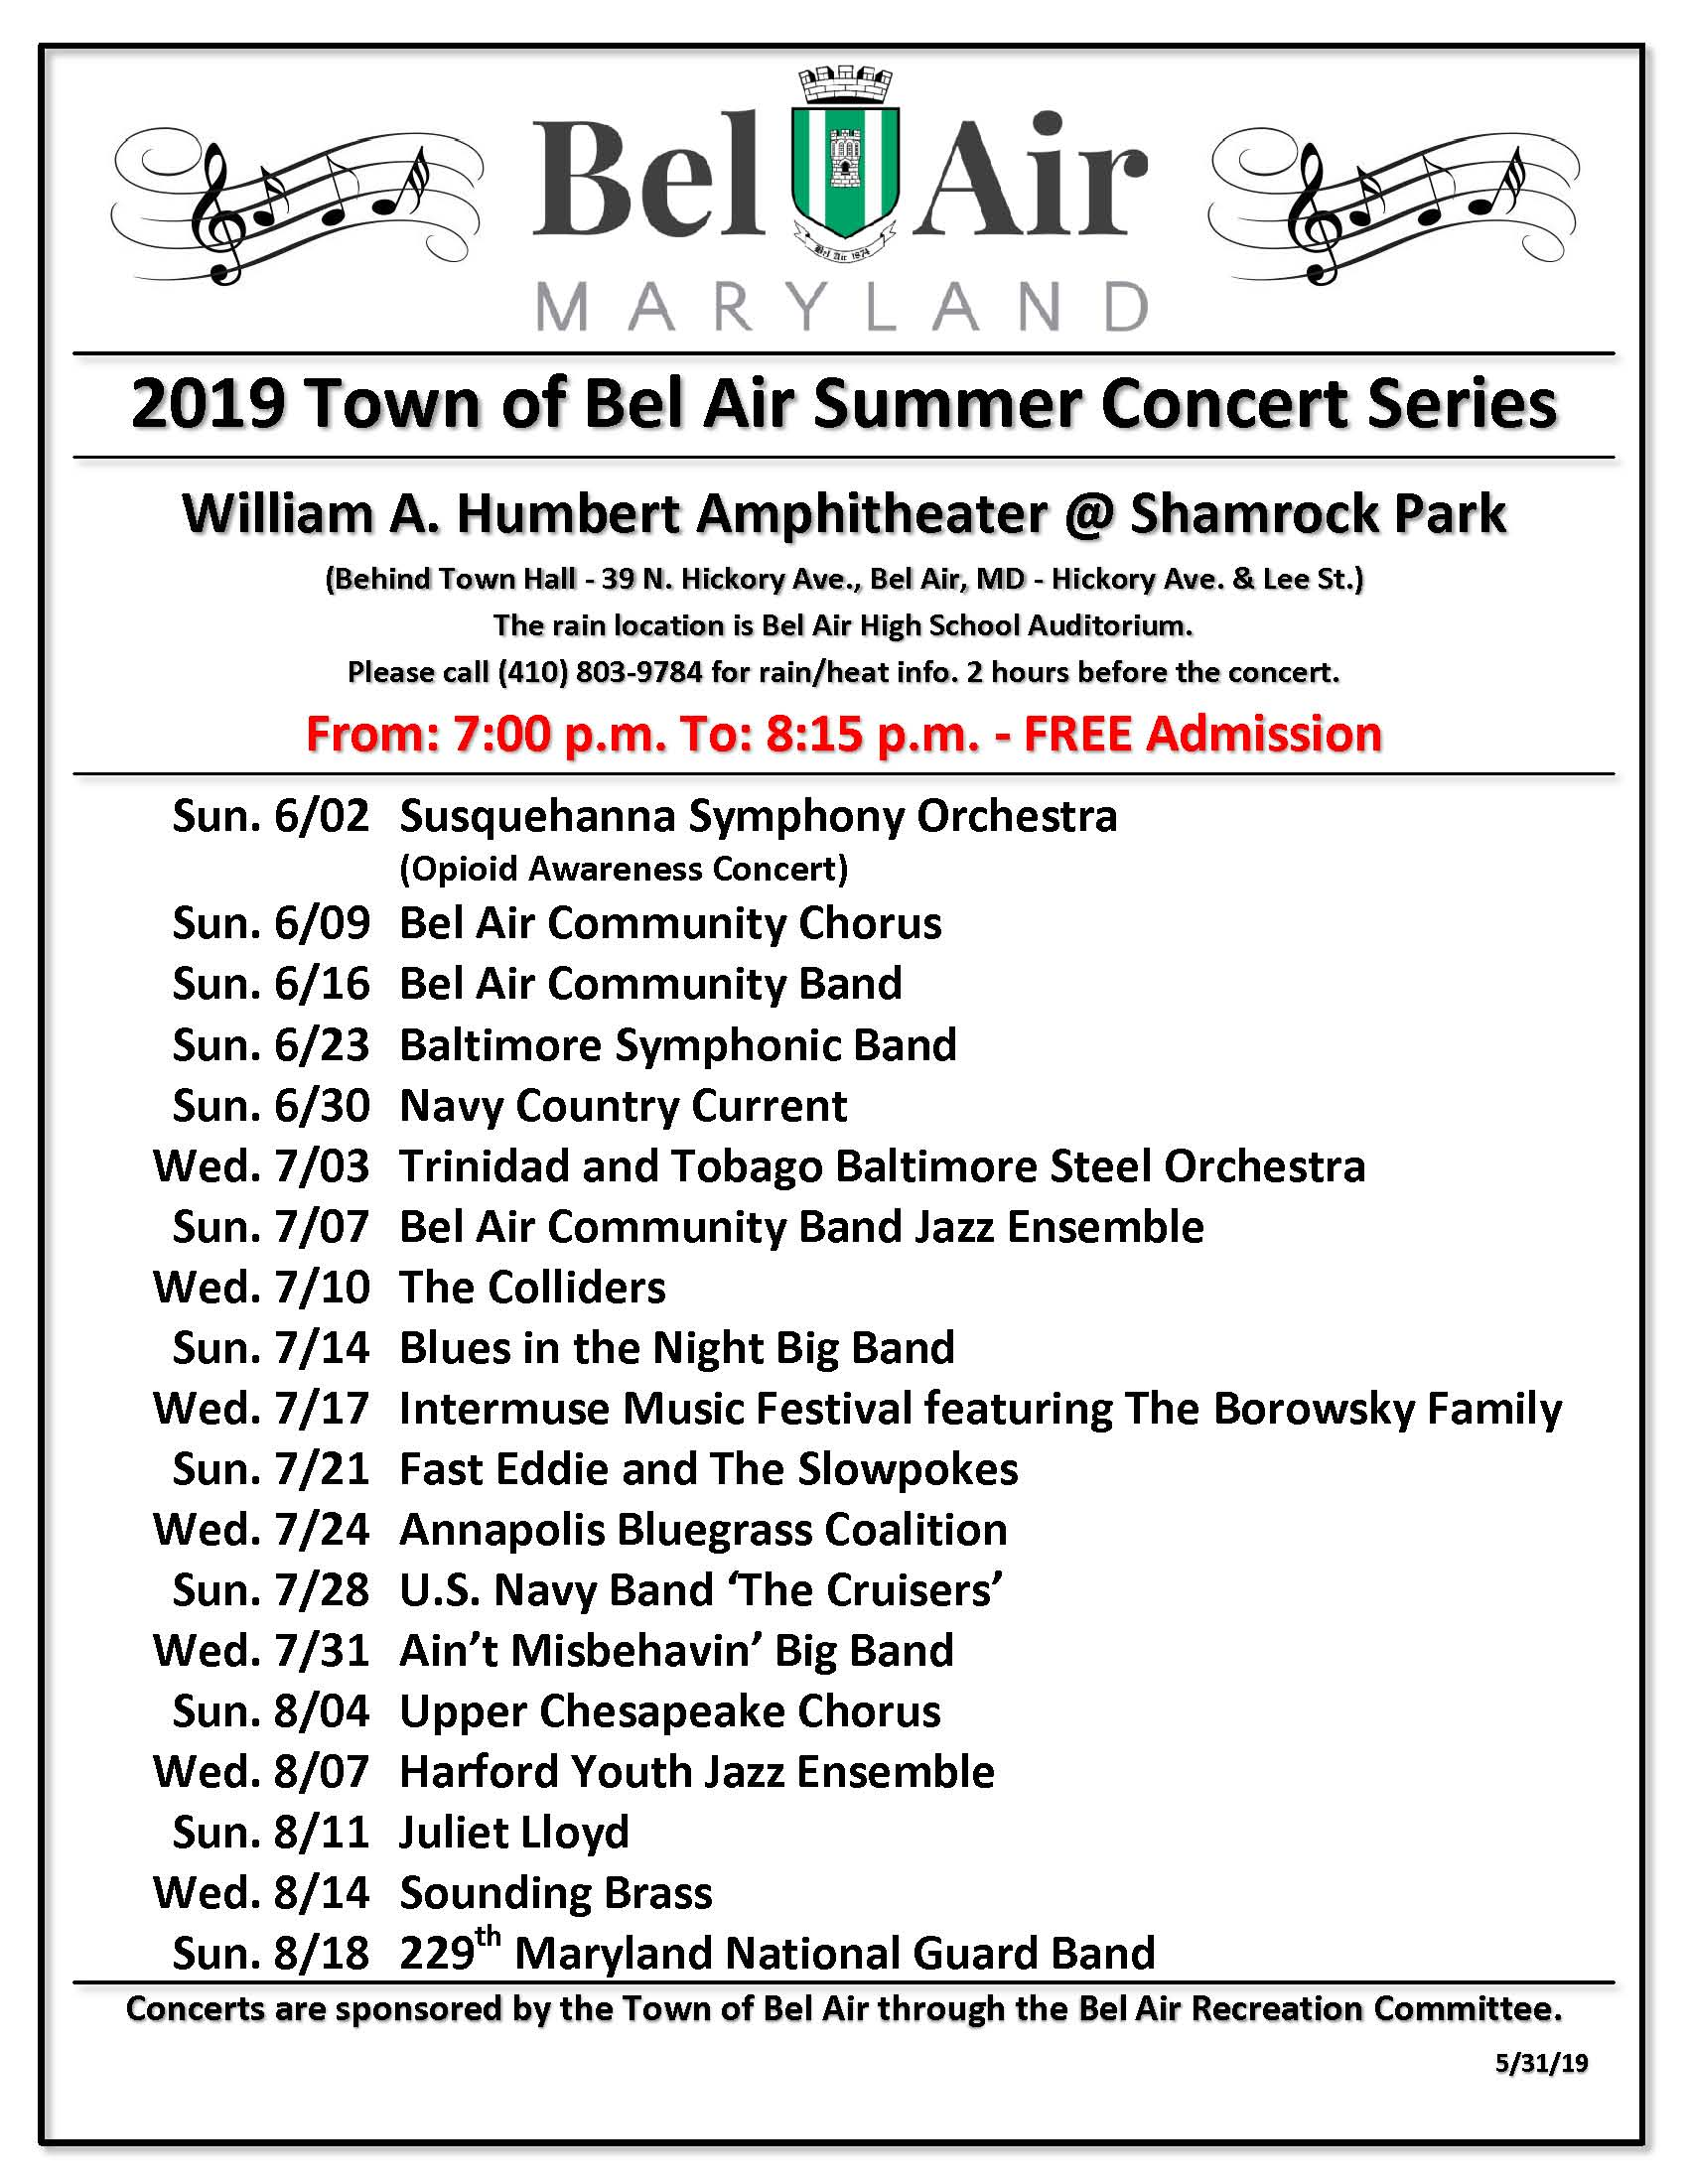 Summer Concert Series 2019 Schedule of Events Flyer 05.30.19 wo grid.jpg